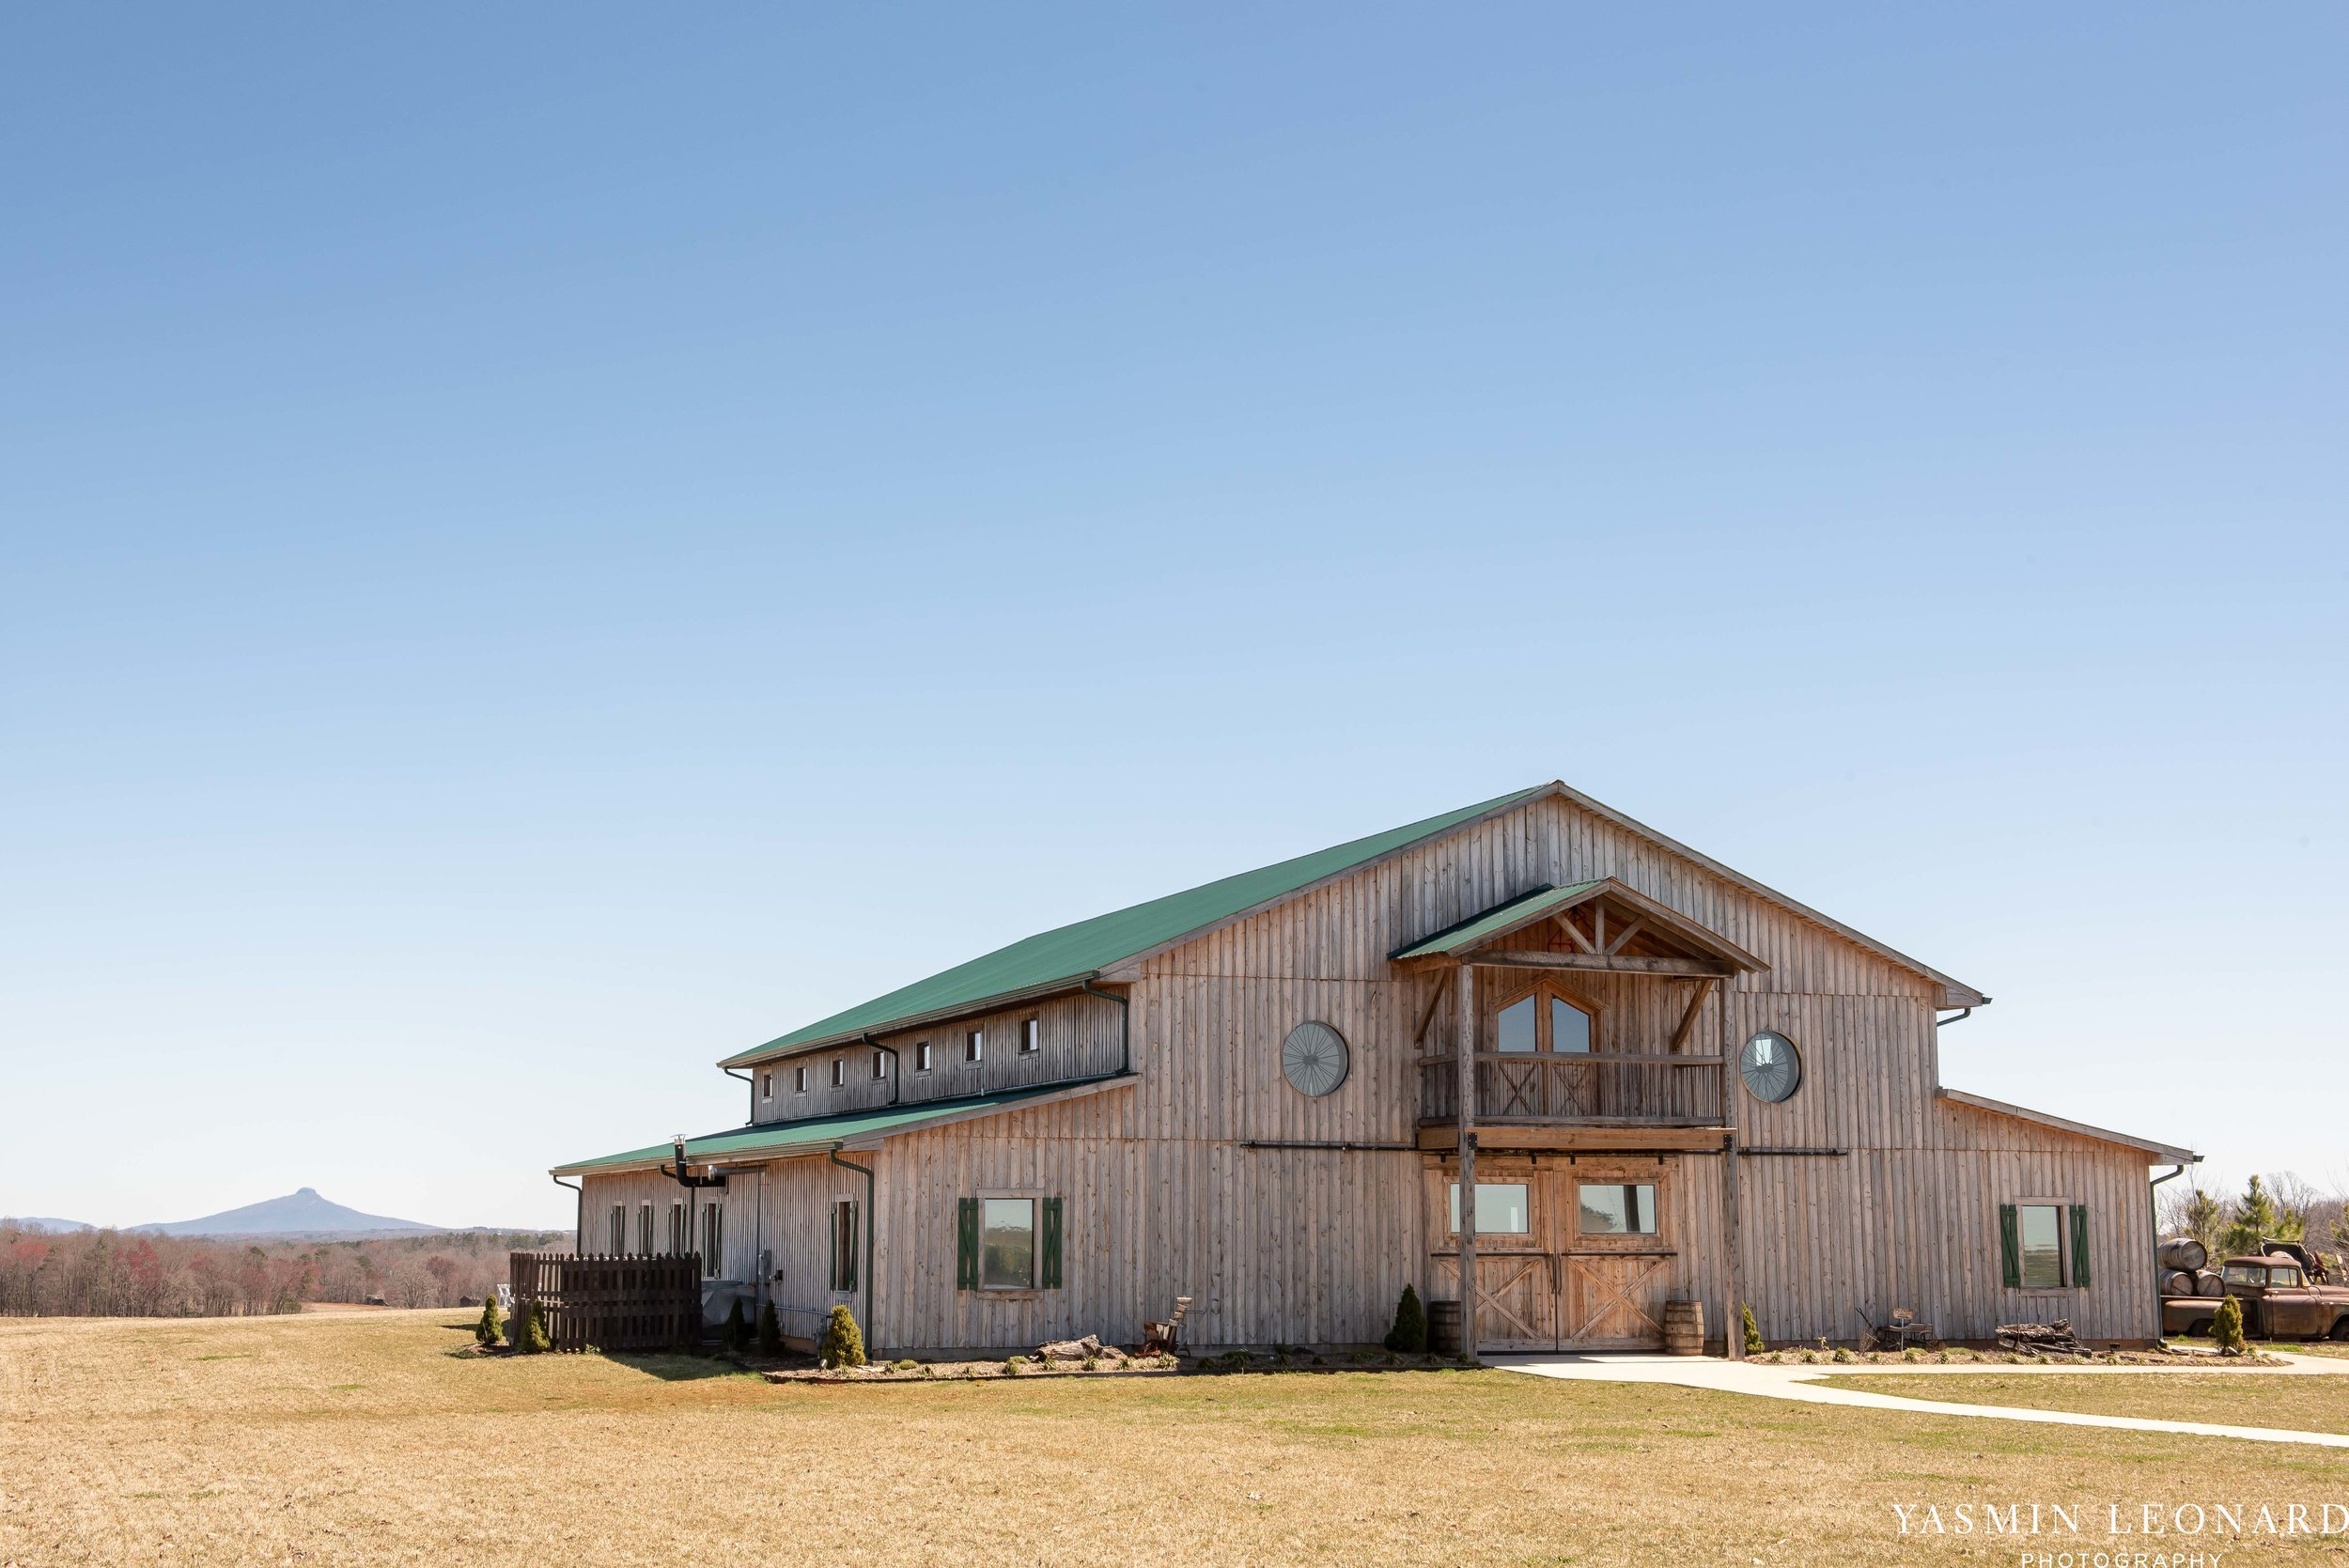 The Barn at Heritage Farm - Country Wedding - Pink and Blue Wedding - Barn Wedding - Outdoor Wedding - Cotton and Wheat Decor - Groom in Bibs - Pink Bridal Colors - Yasmin Leonard Photography-1.jpg